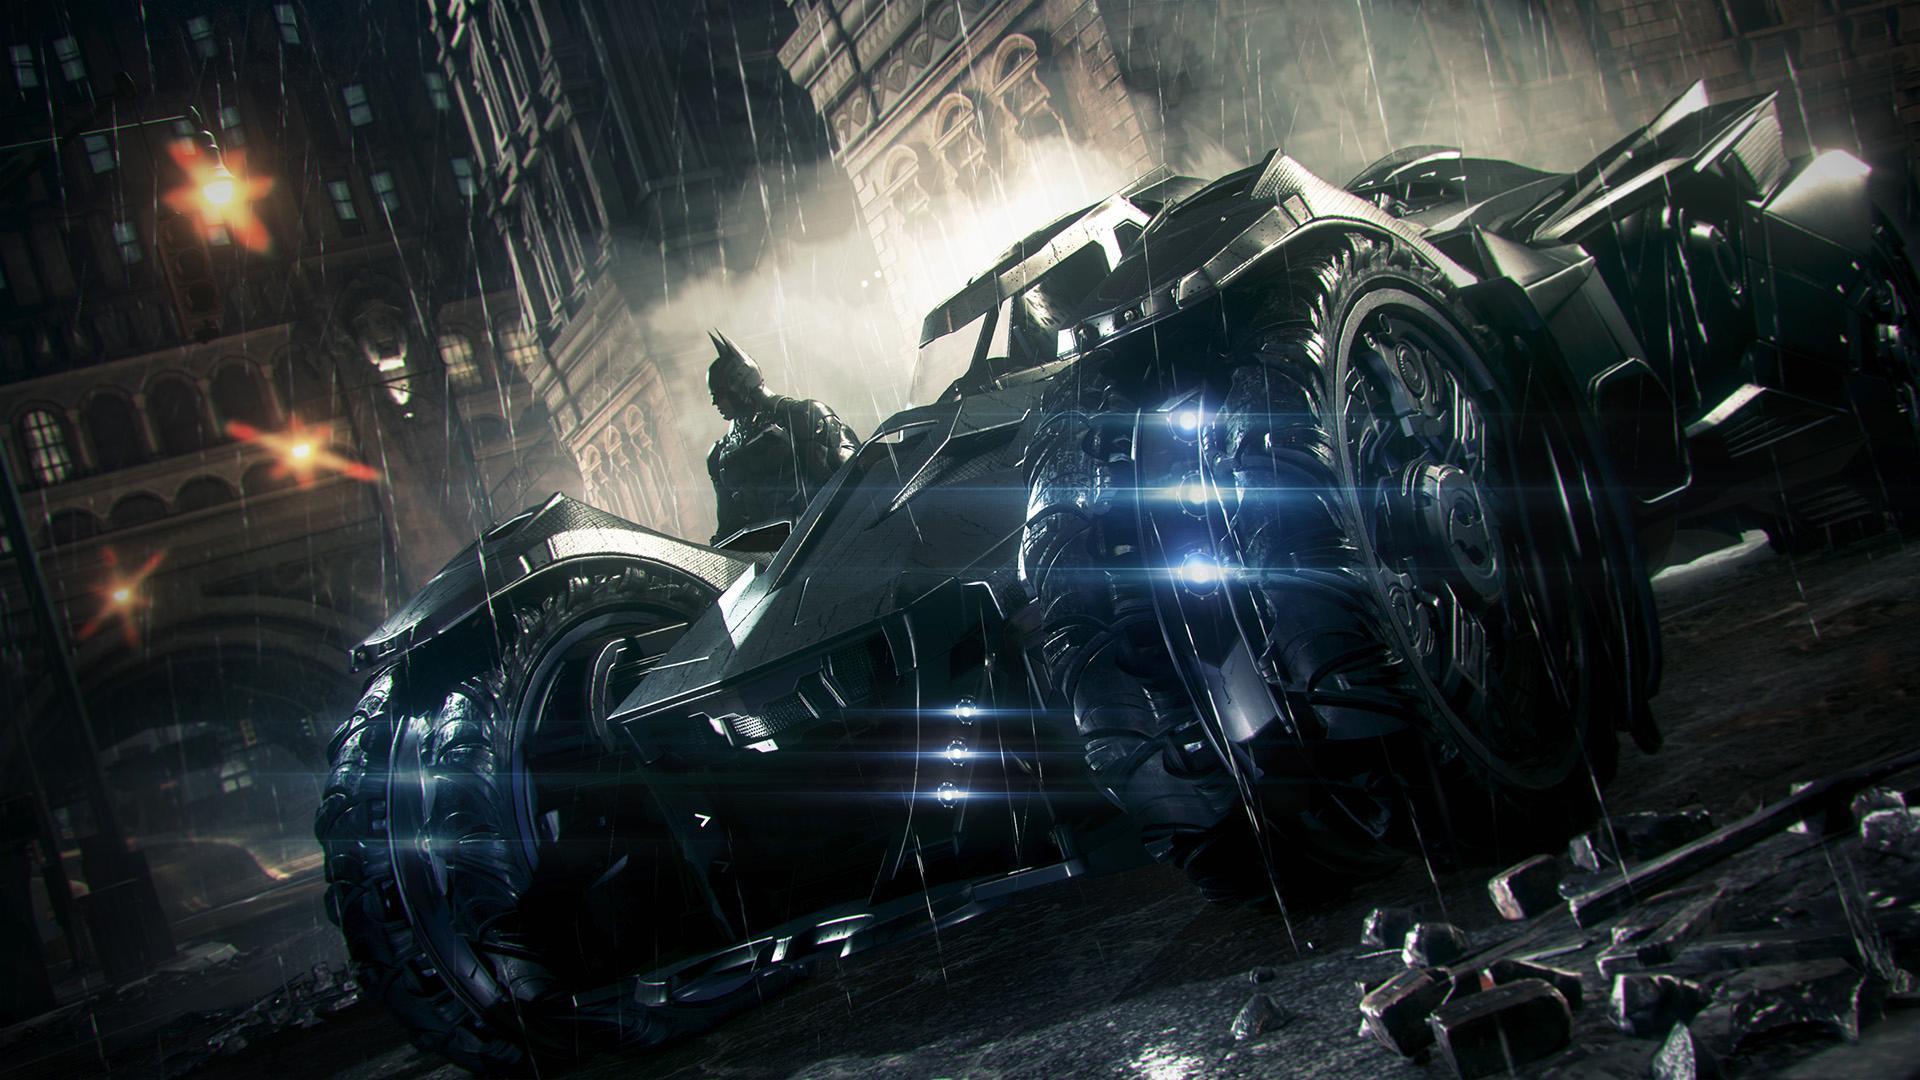 Amazoncom Batman Arkham Knight Online Game Code Video Games